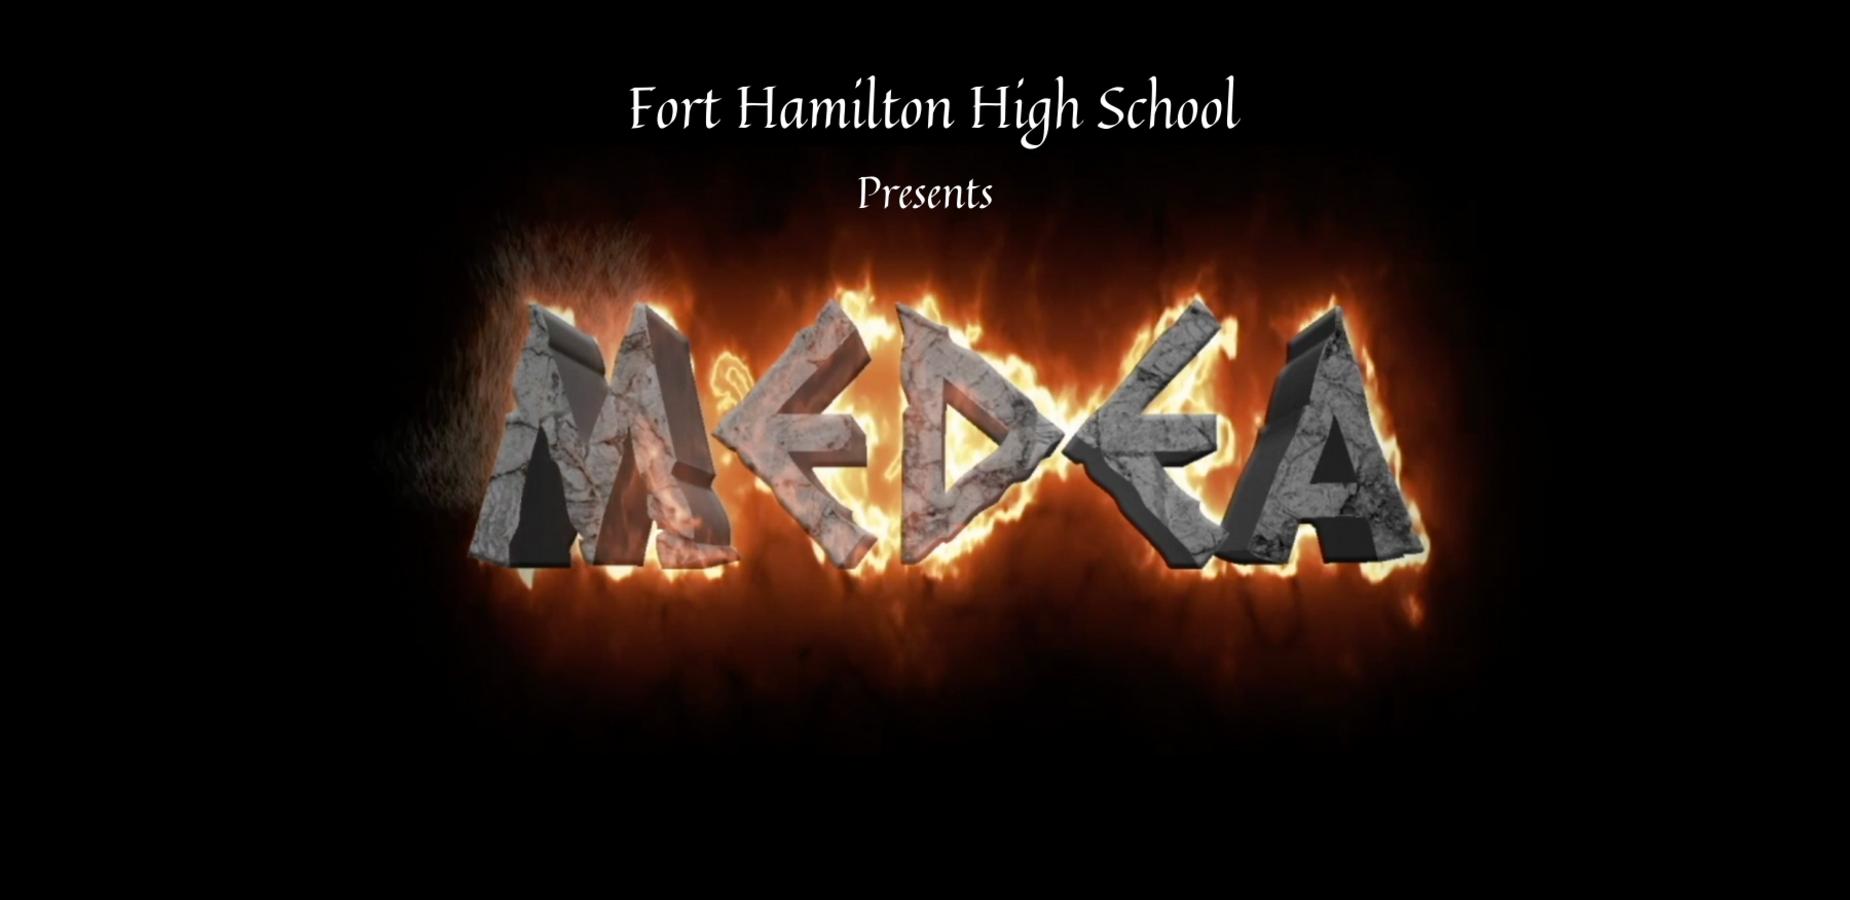 Fort Hamilton High School Presents Medea